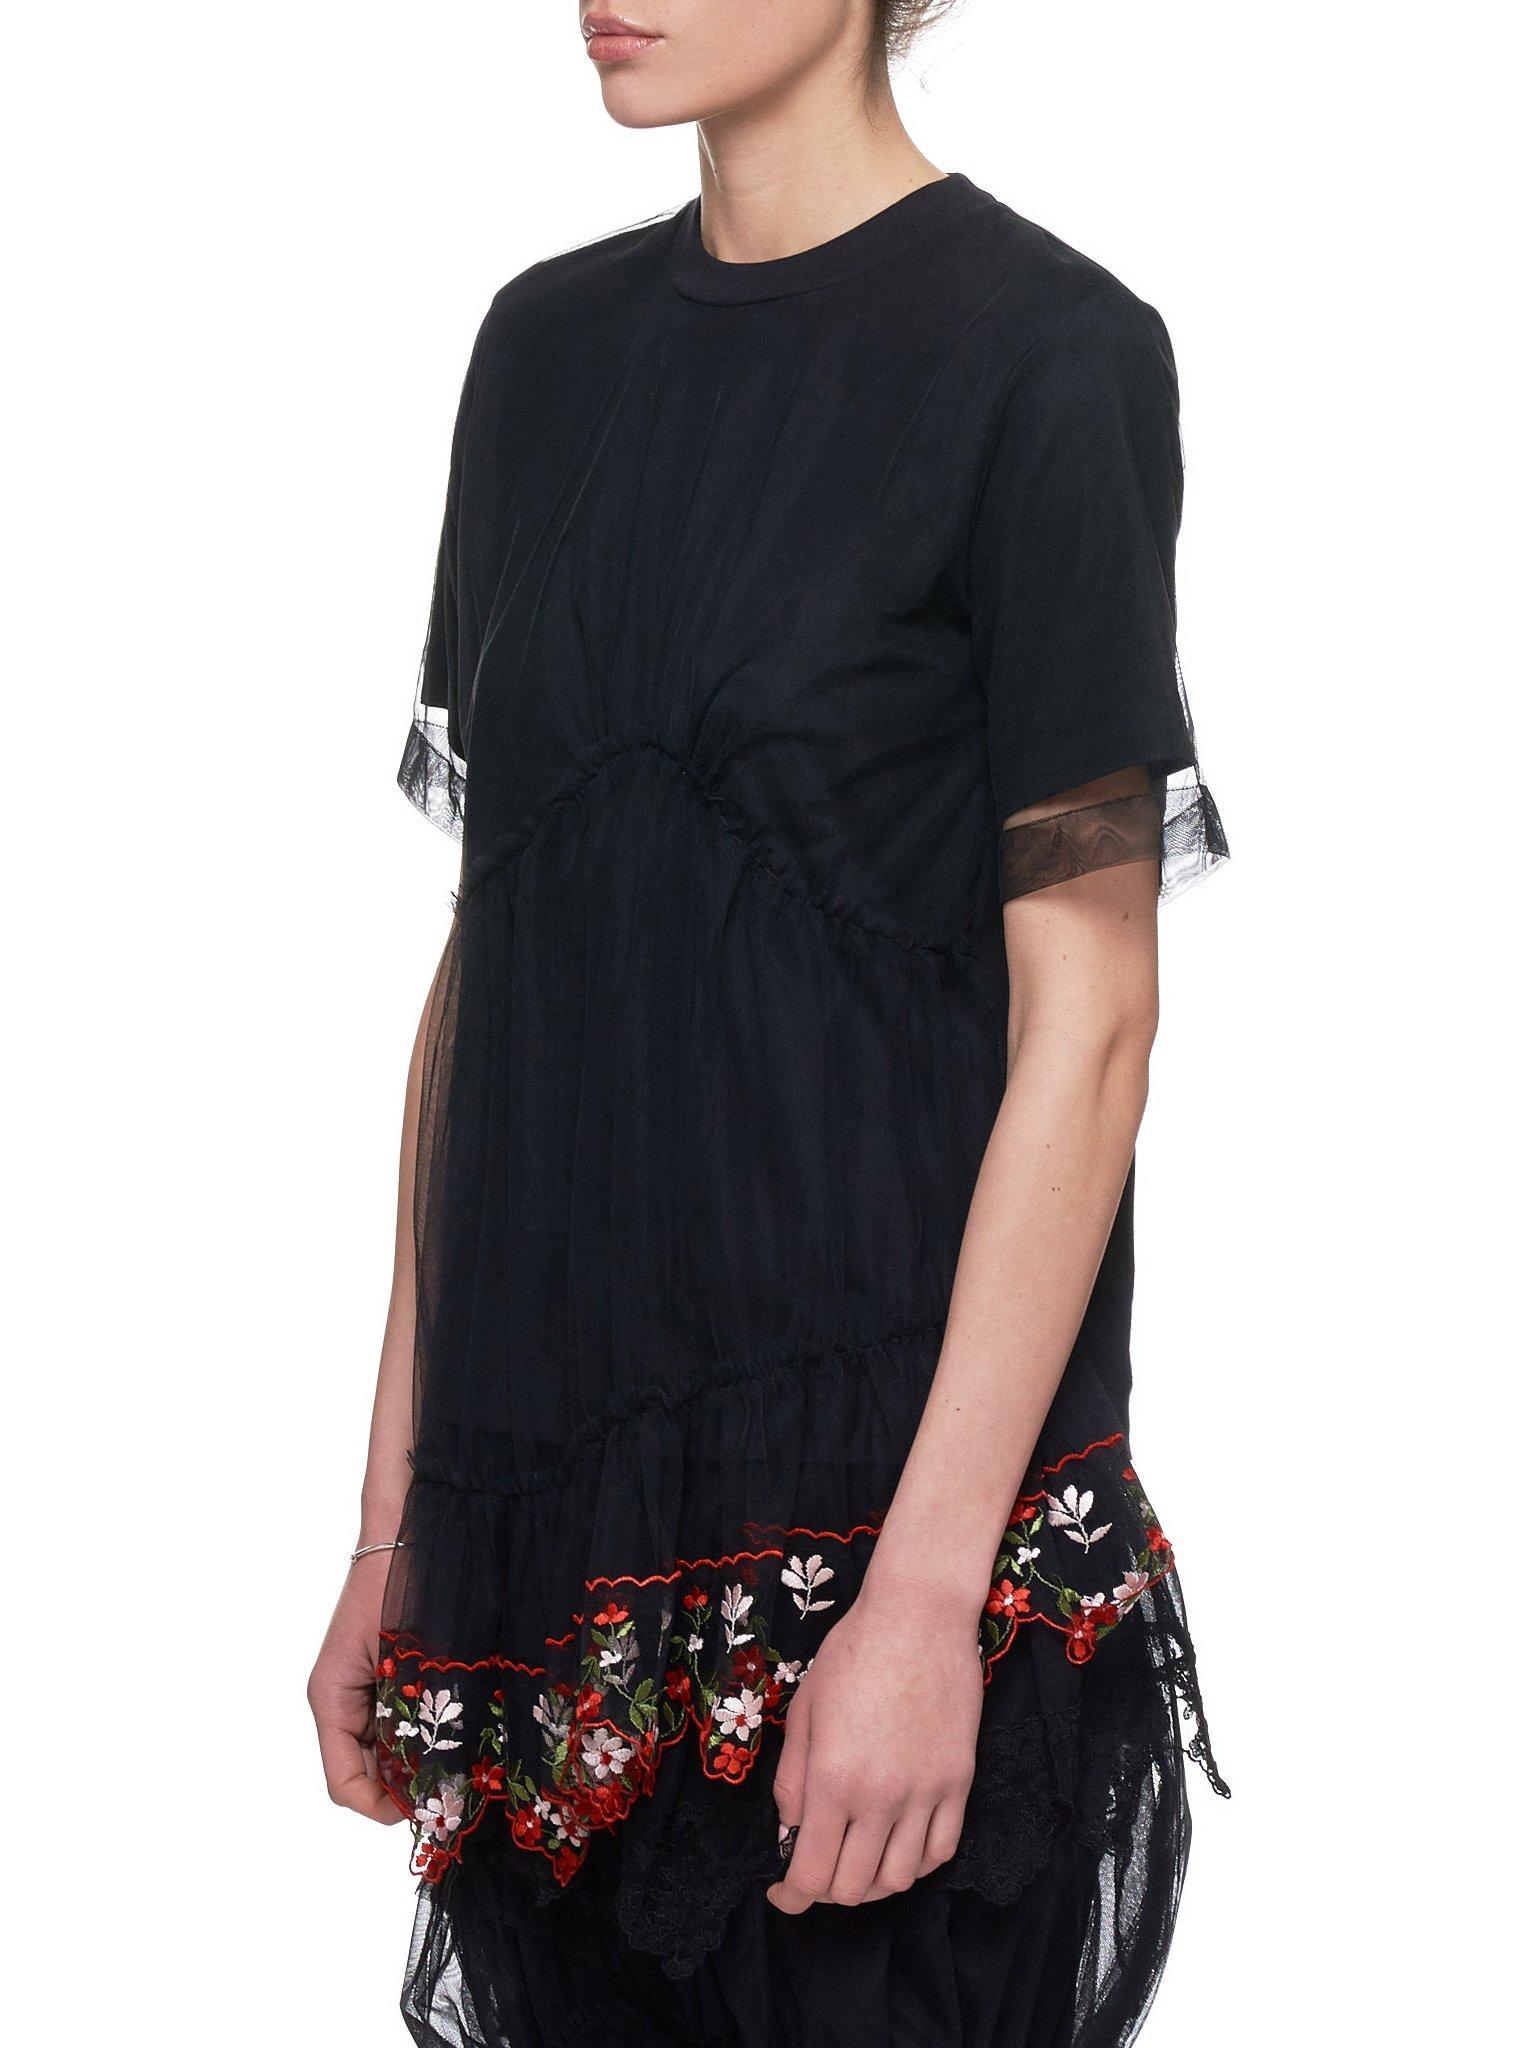 08c7202076acd Lyst - Simone Rocha Tulle T-shirt in Black